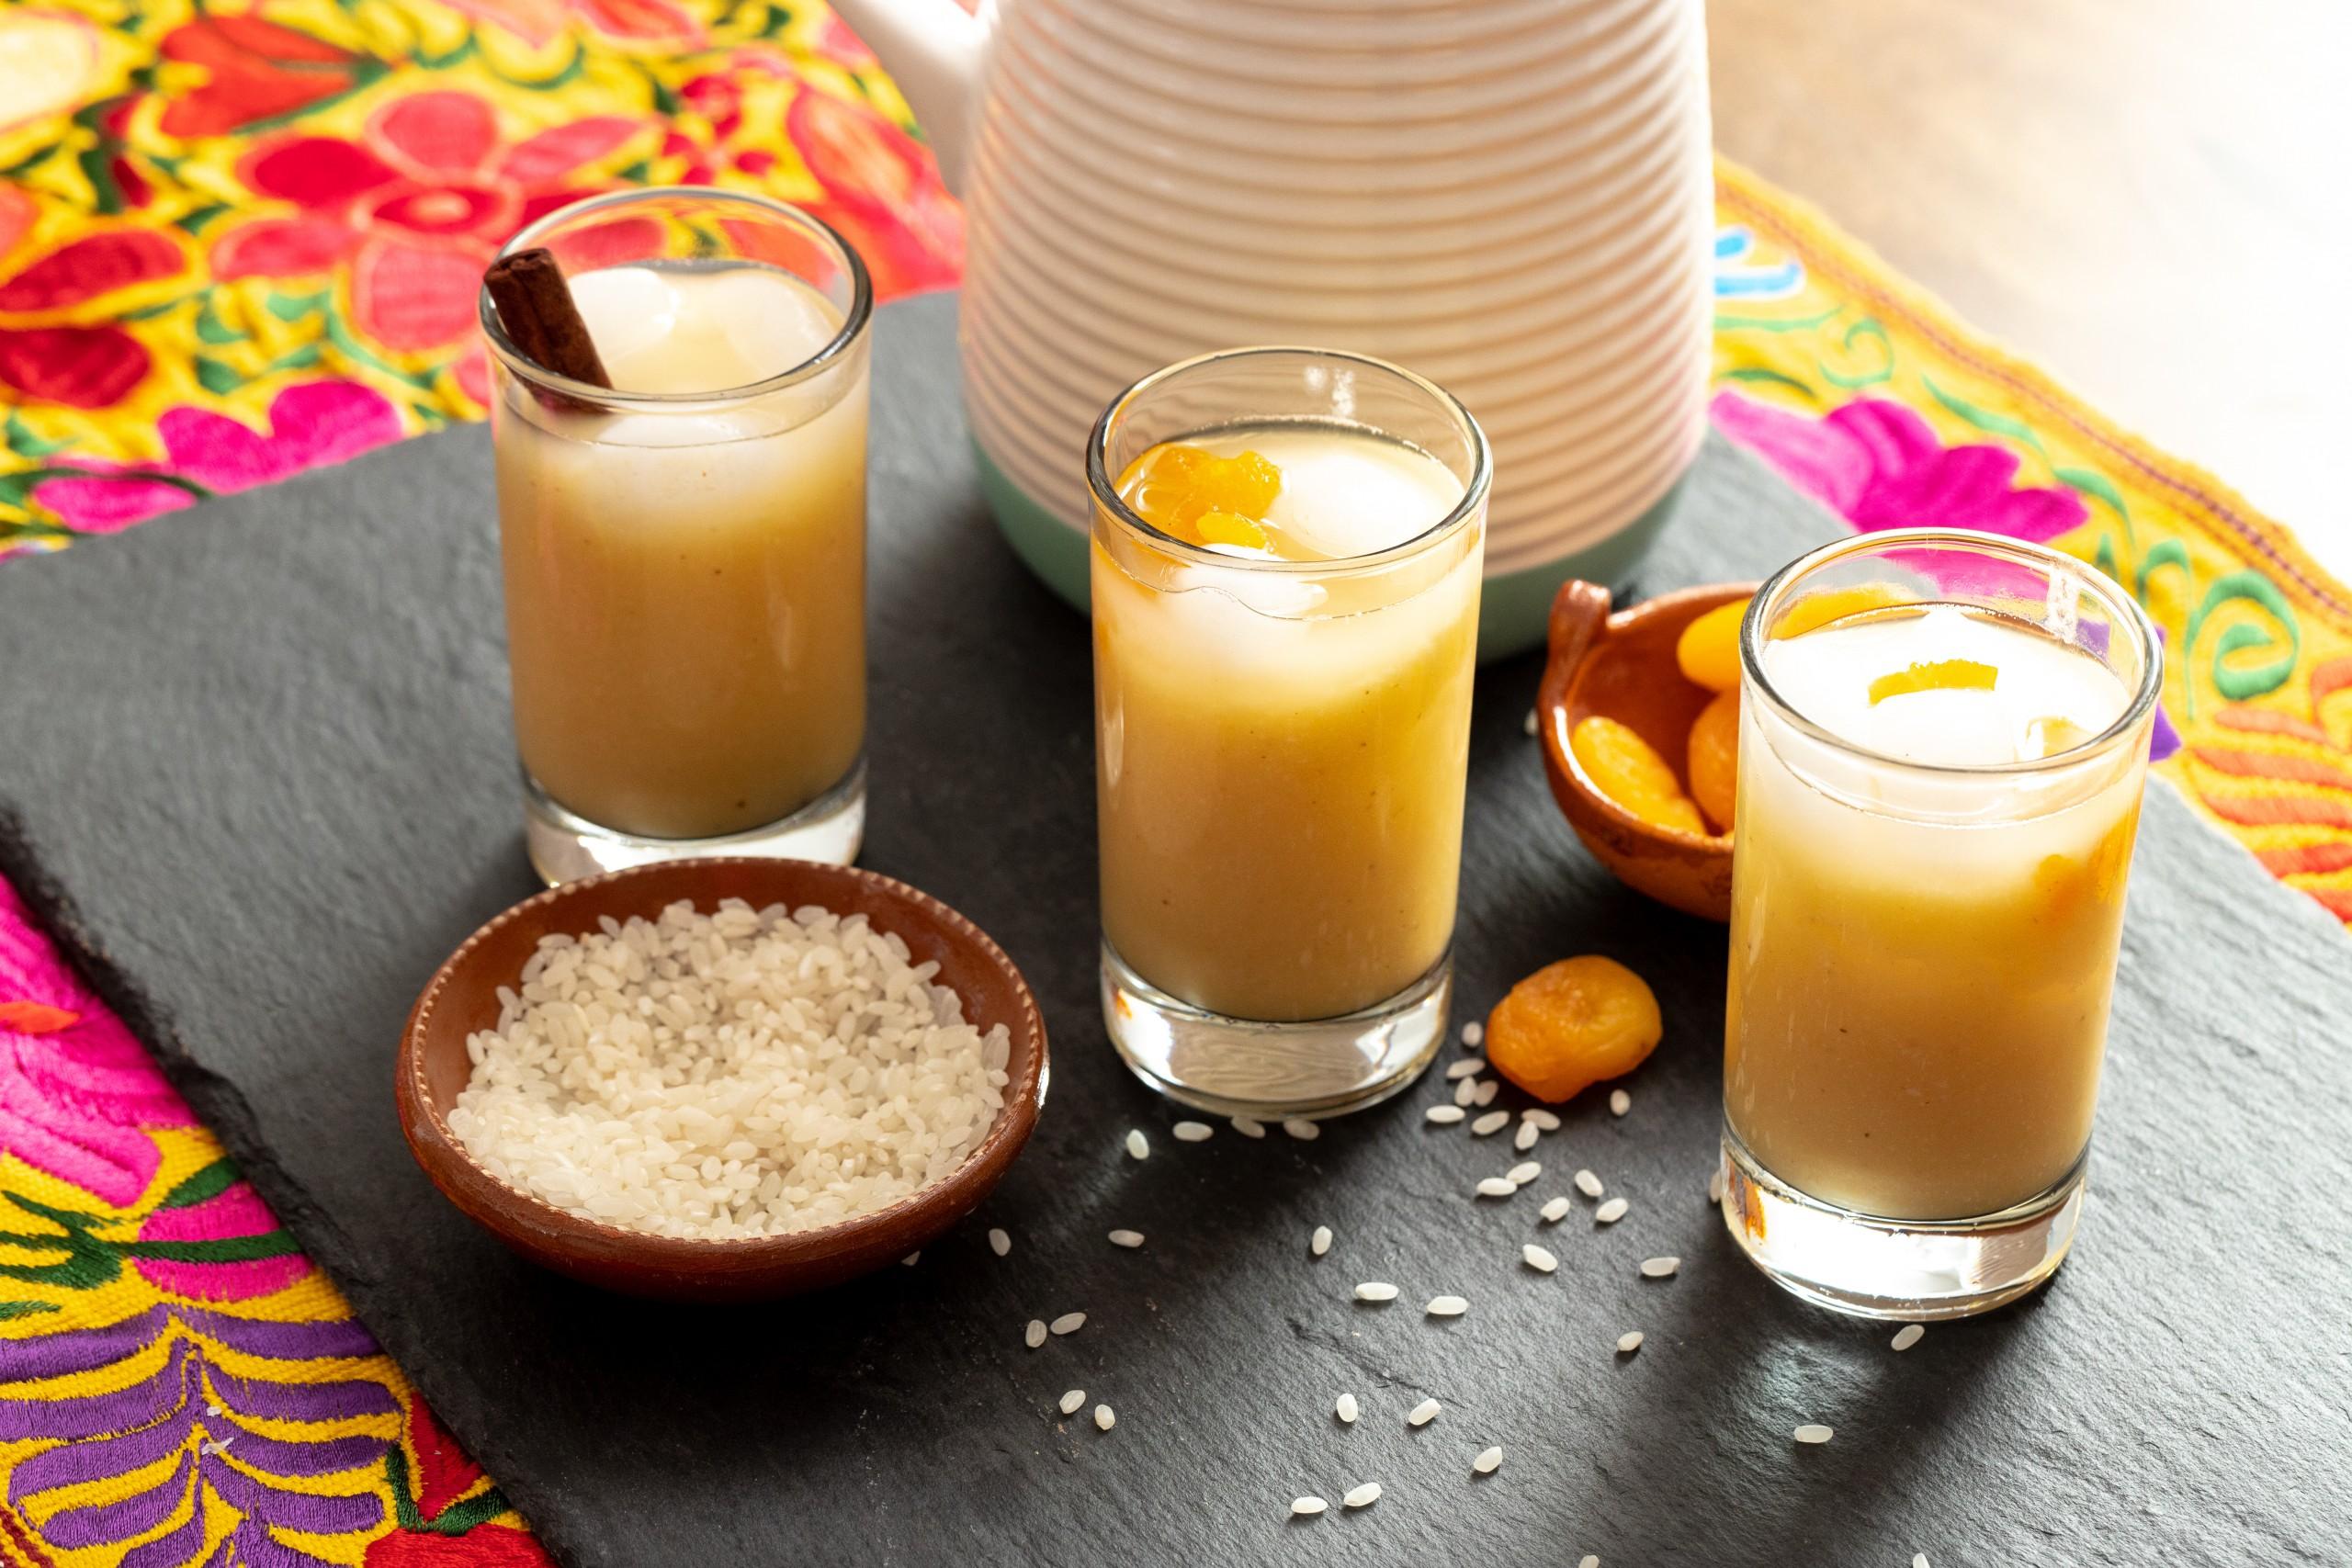 how to make horchata in a blender